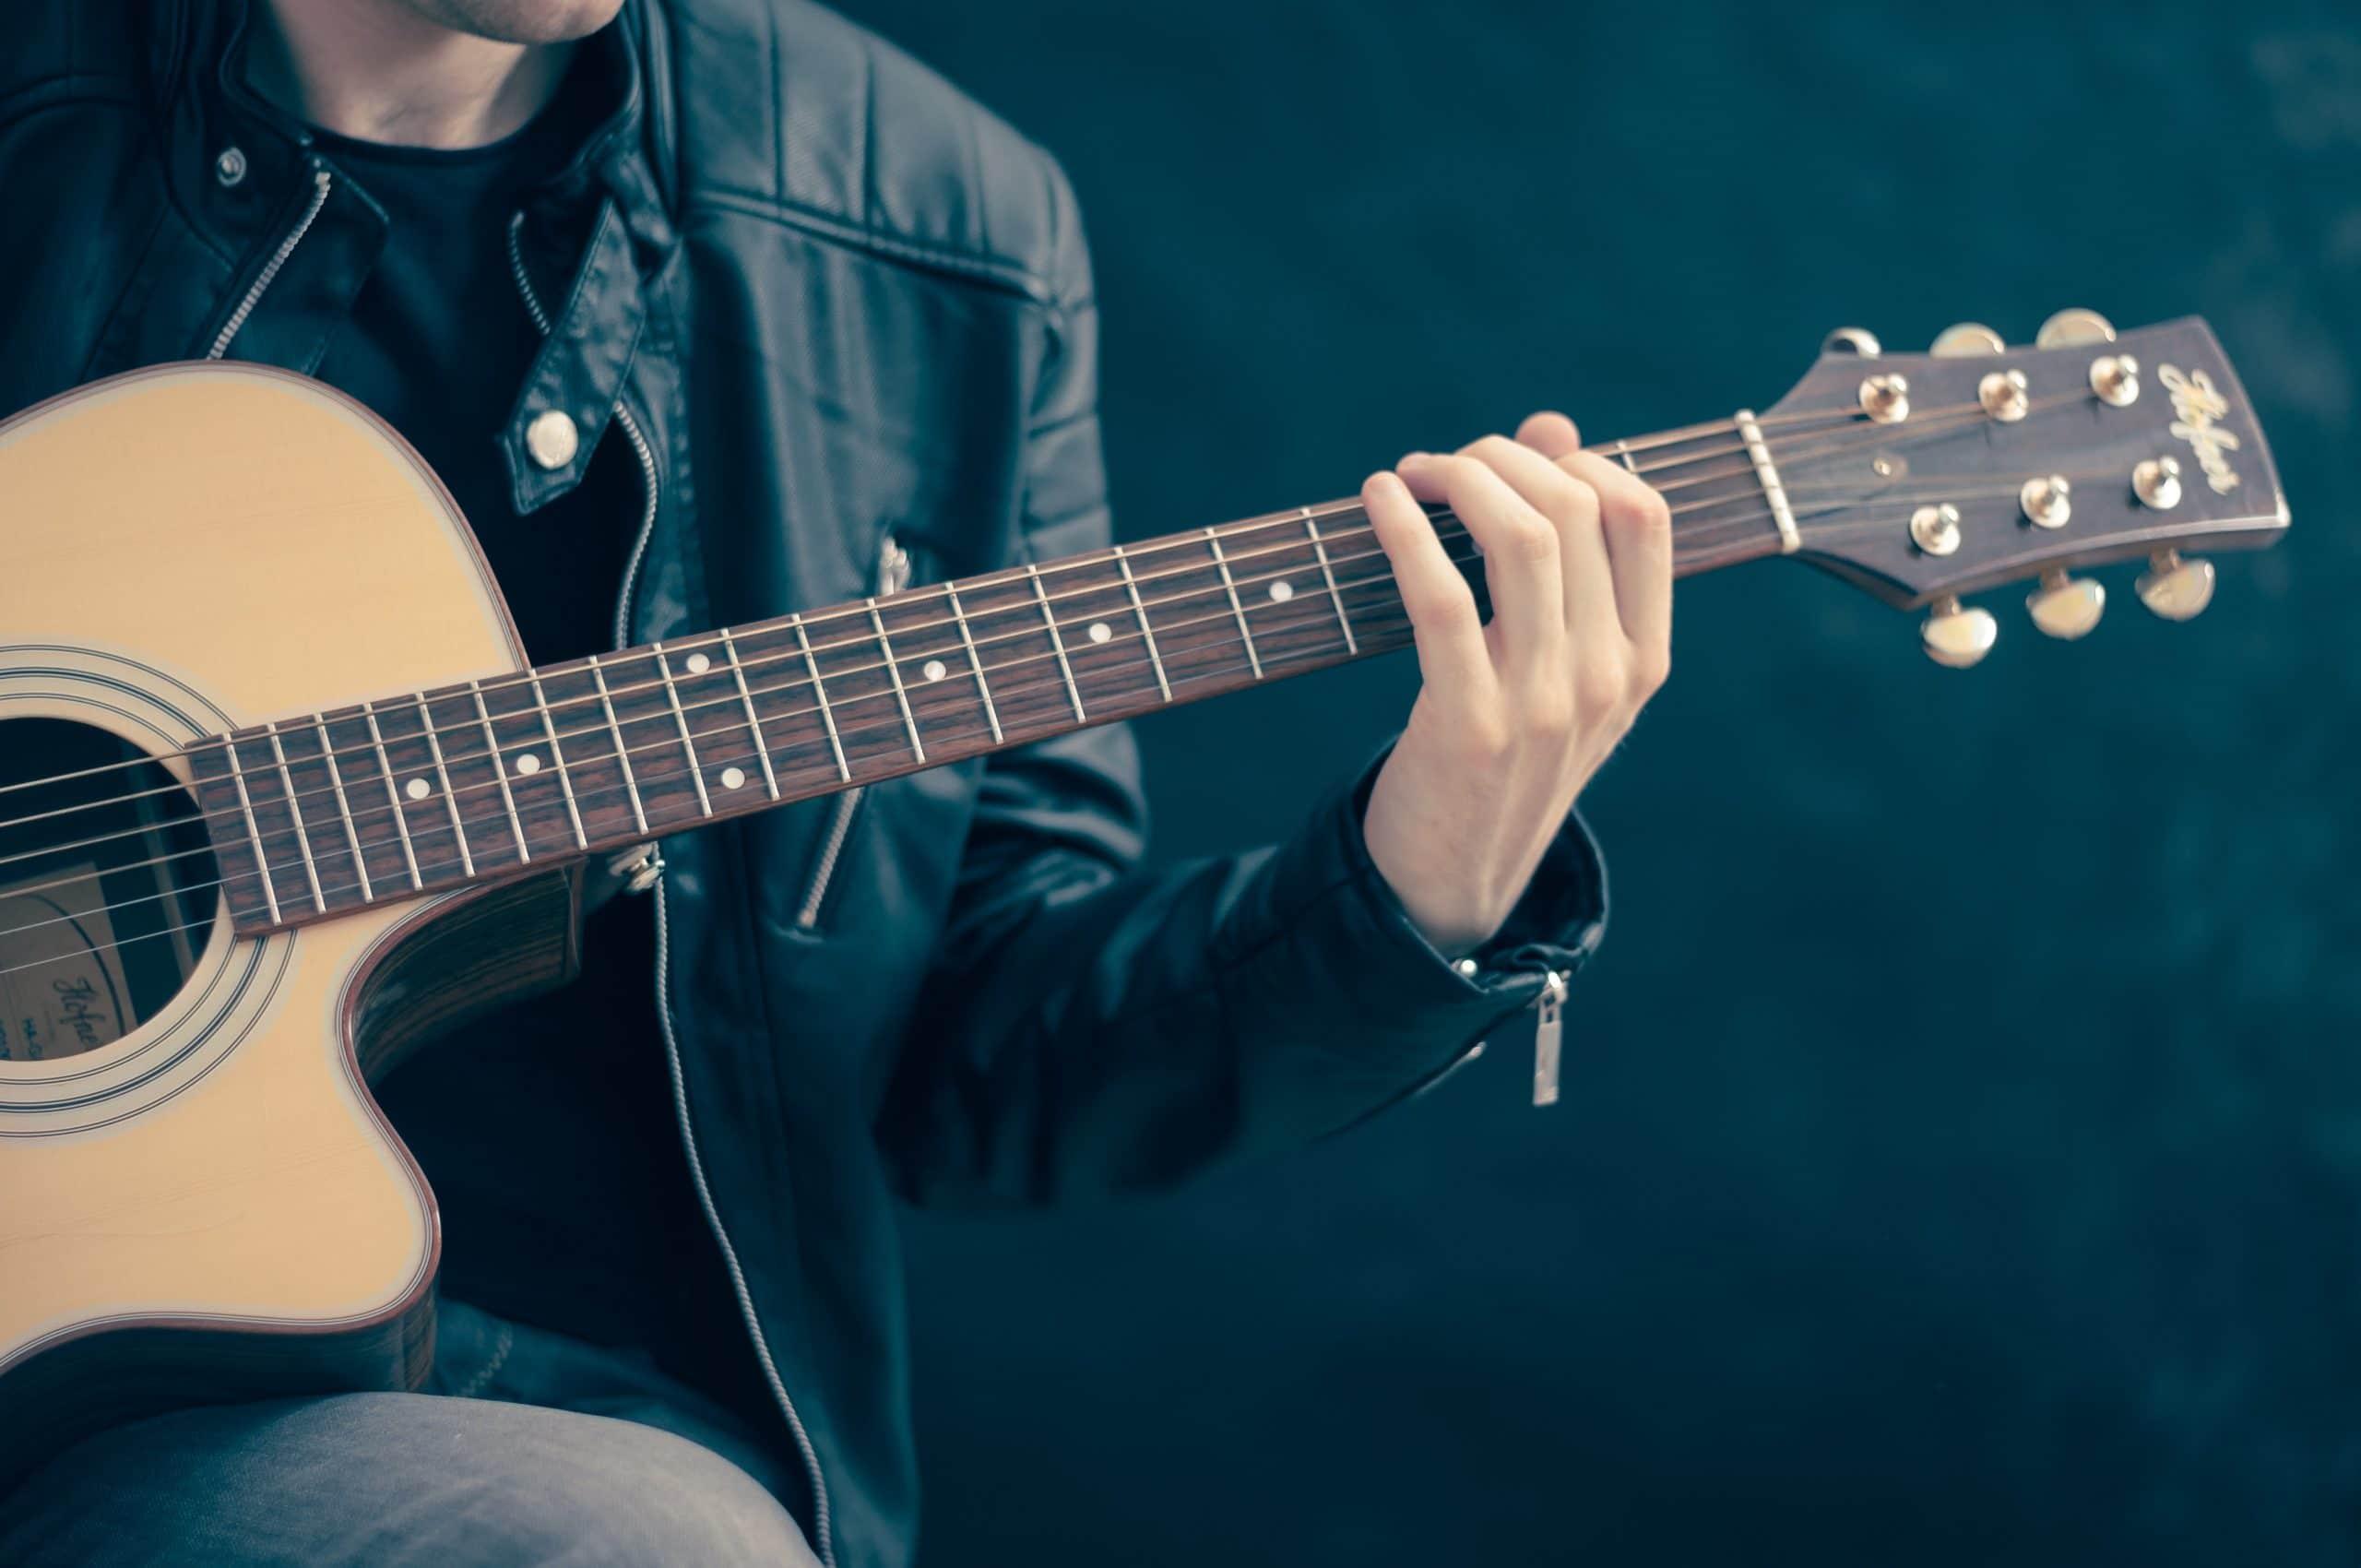 Buy Copyright Free Music Downloads Online